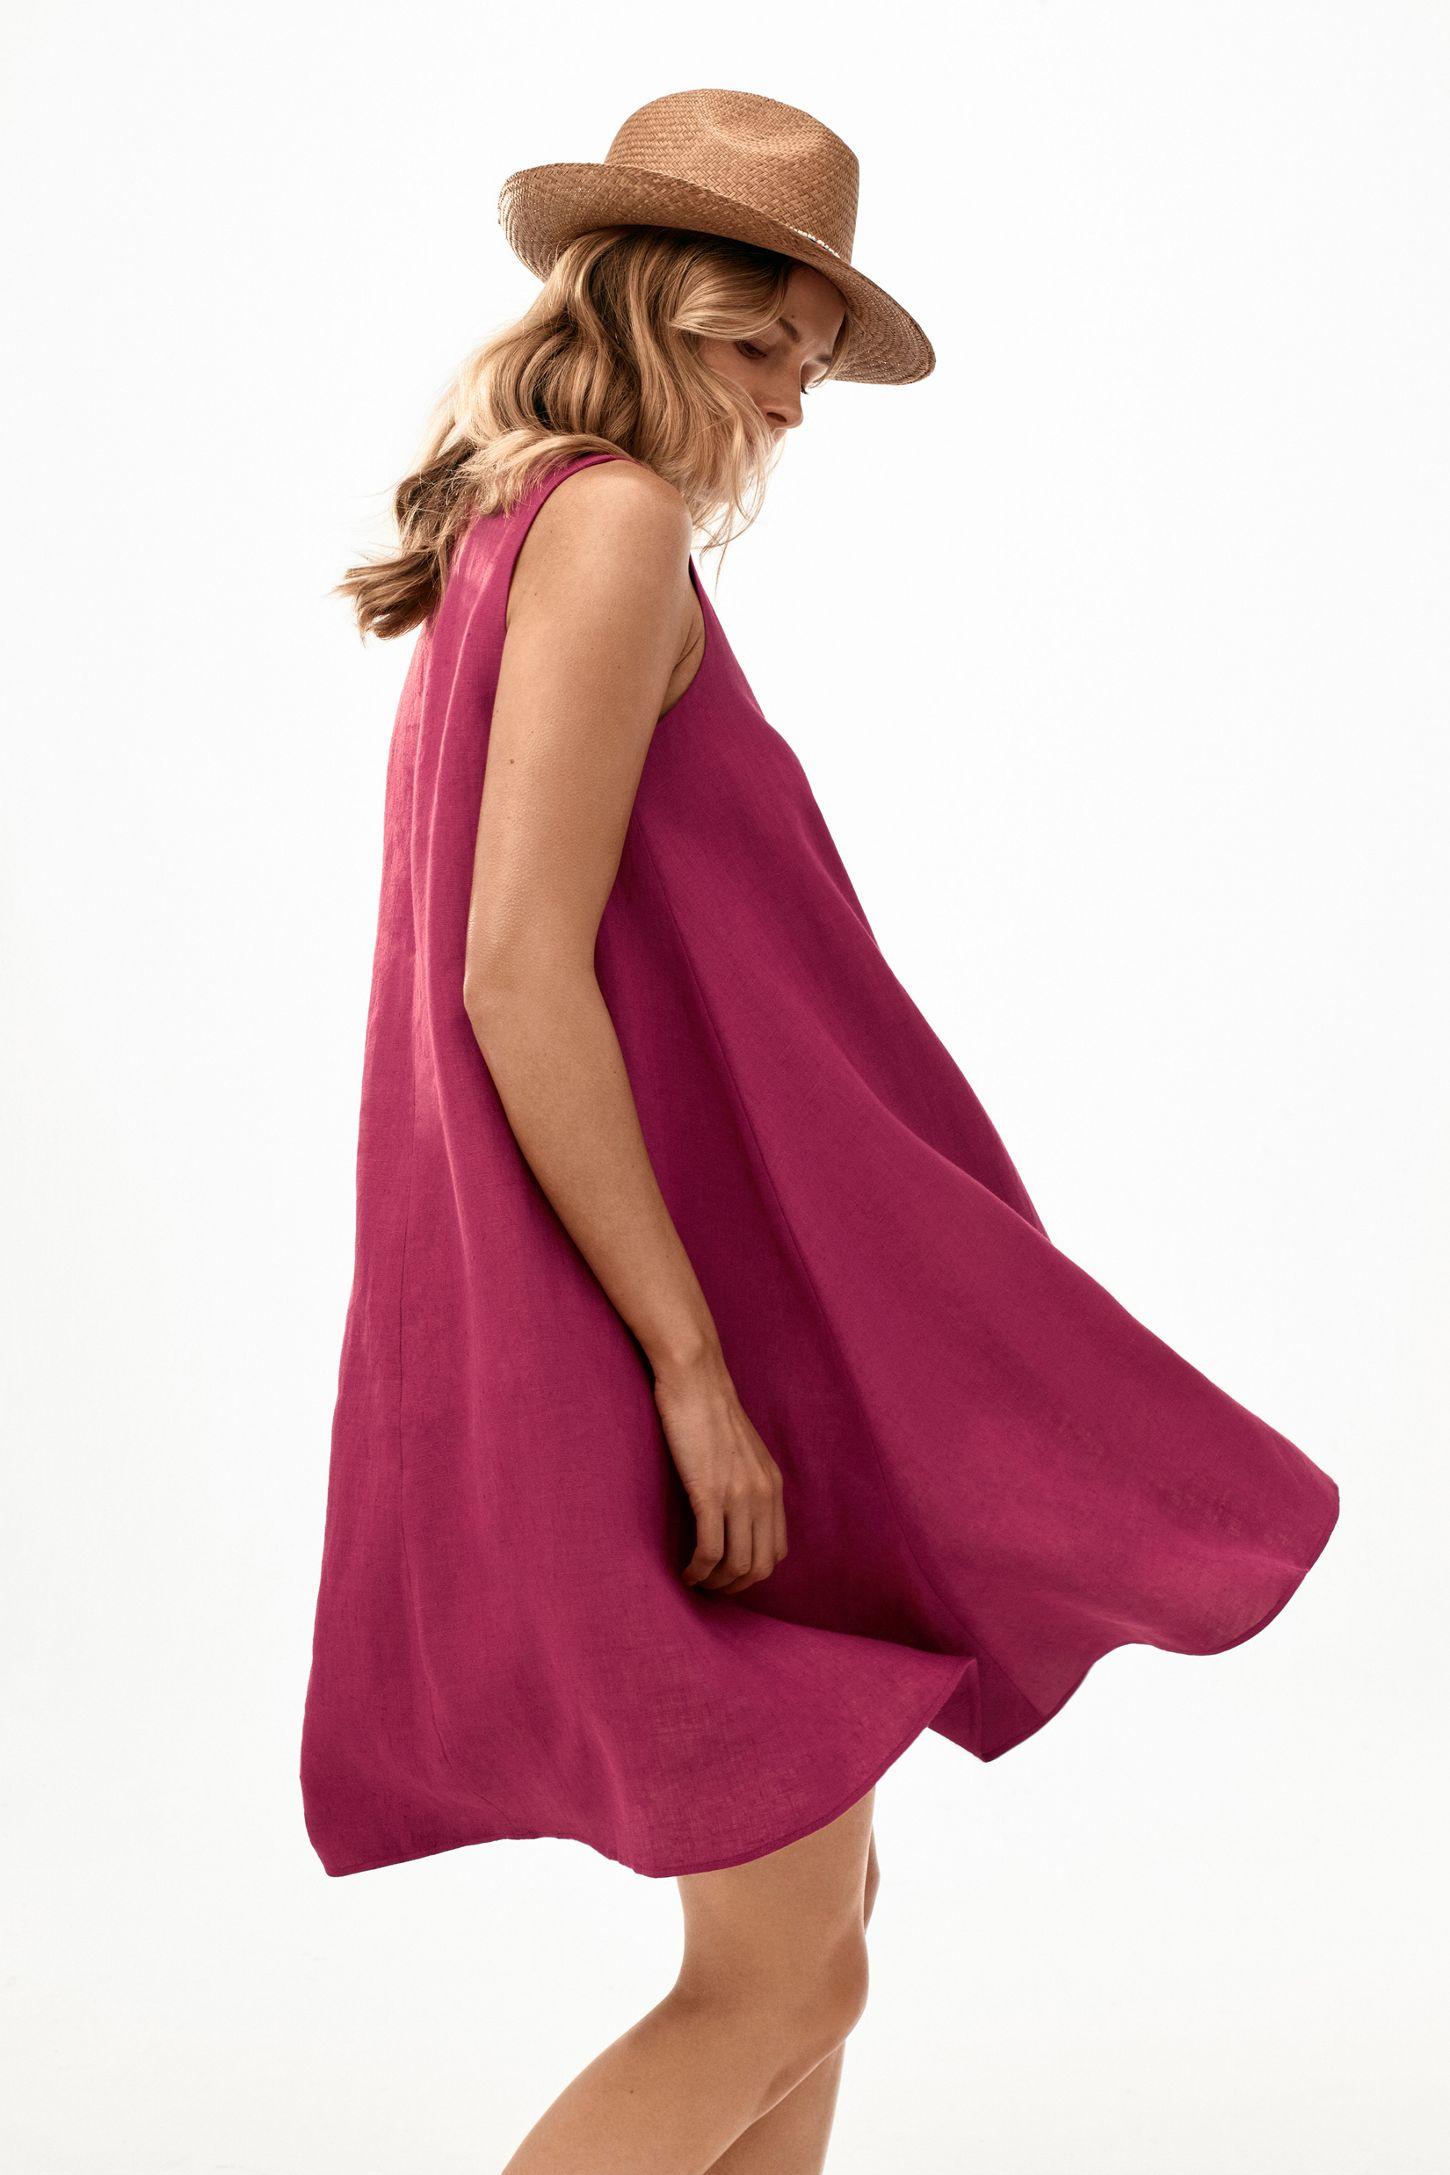 71decec210f2 Melbourne Swing Dress | Anthropologie